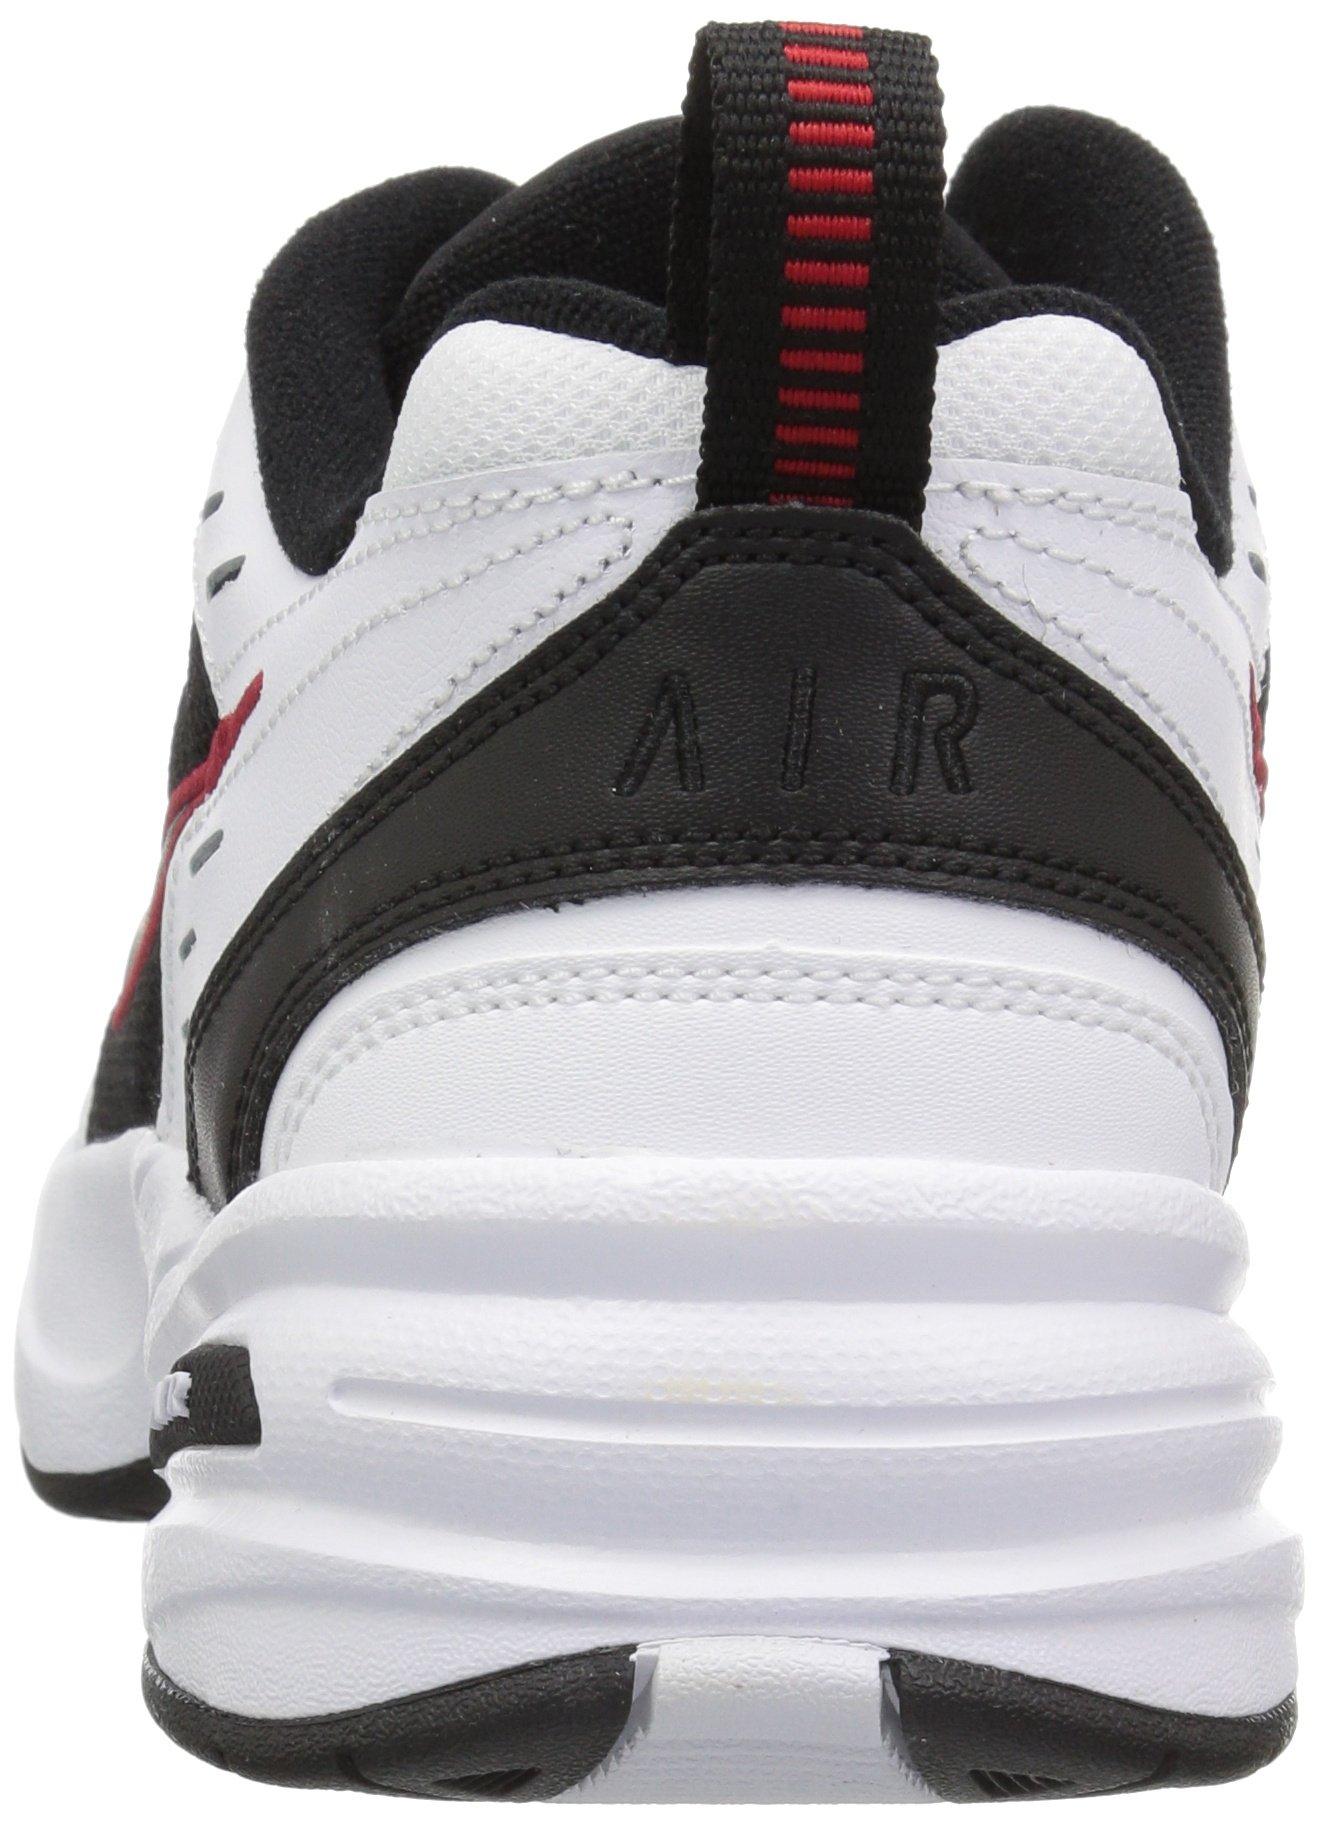 Nike Men's Air Monarch IV Cross Trainer, White/Black, 6.0 Regular US by Nike (Image #2)